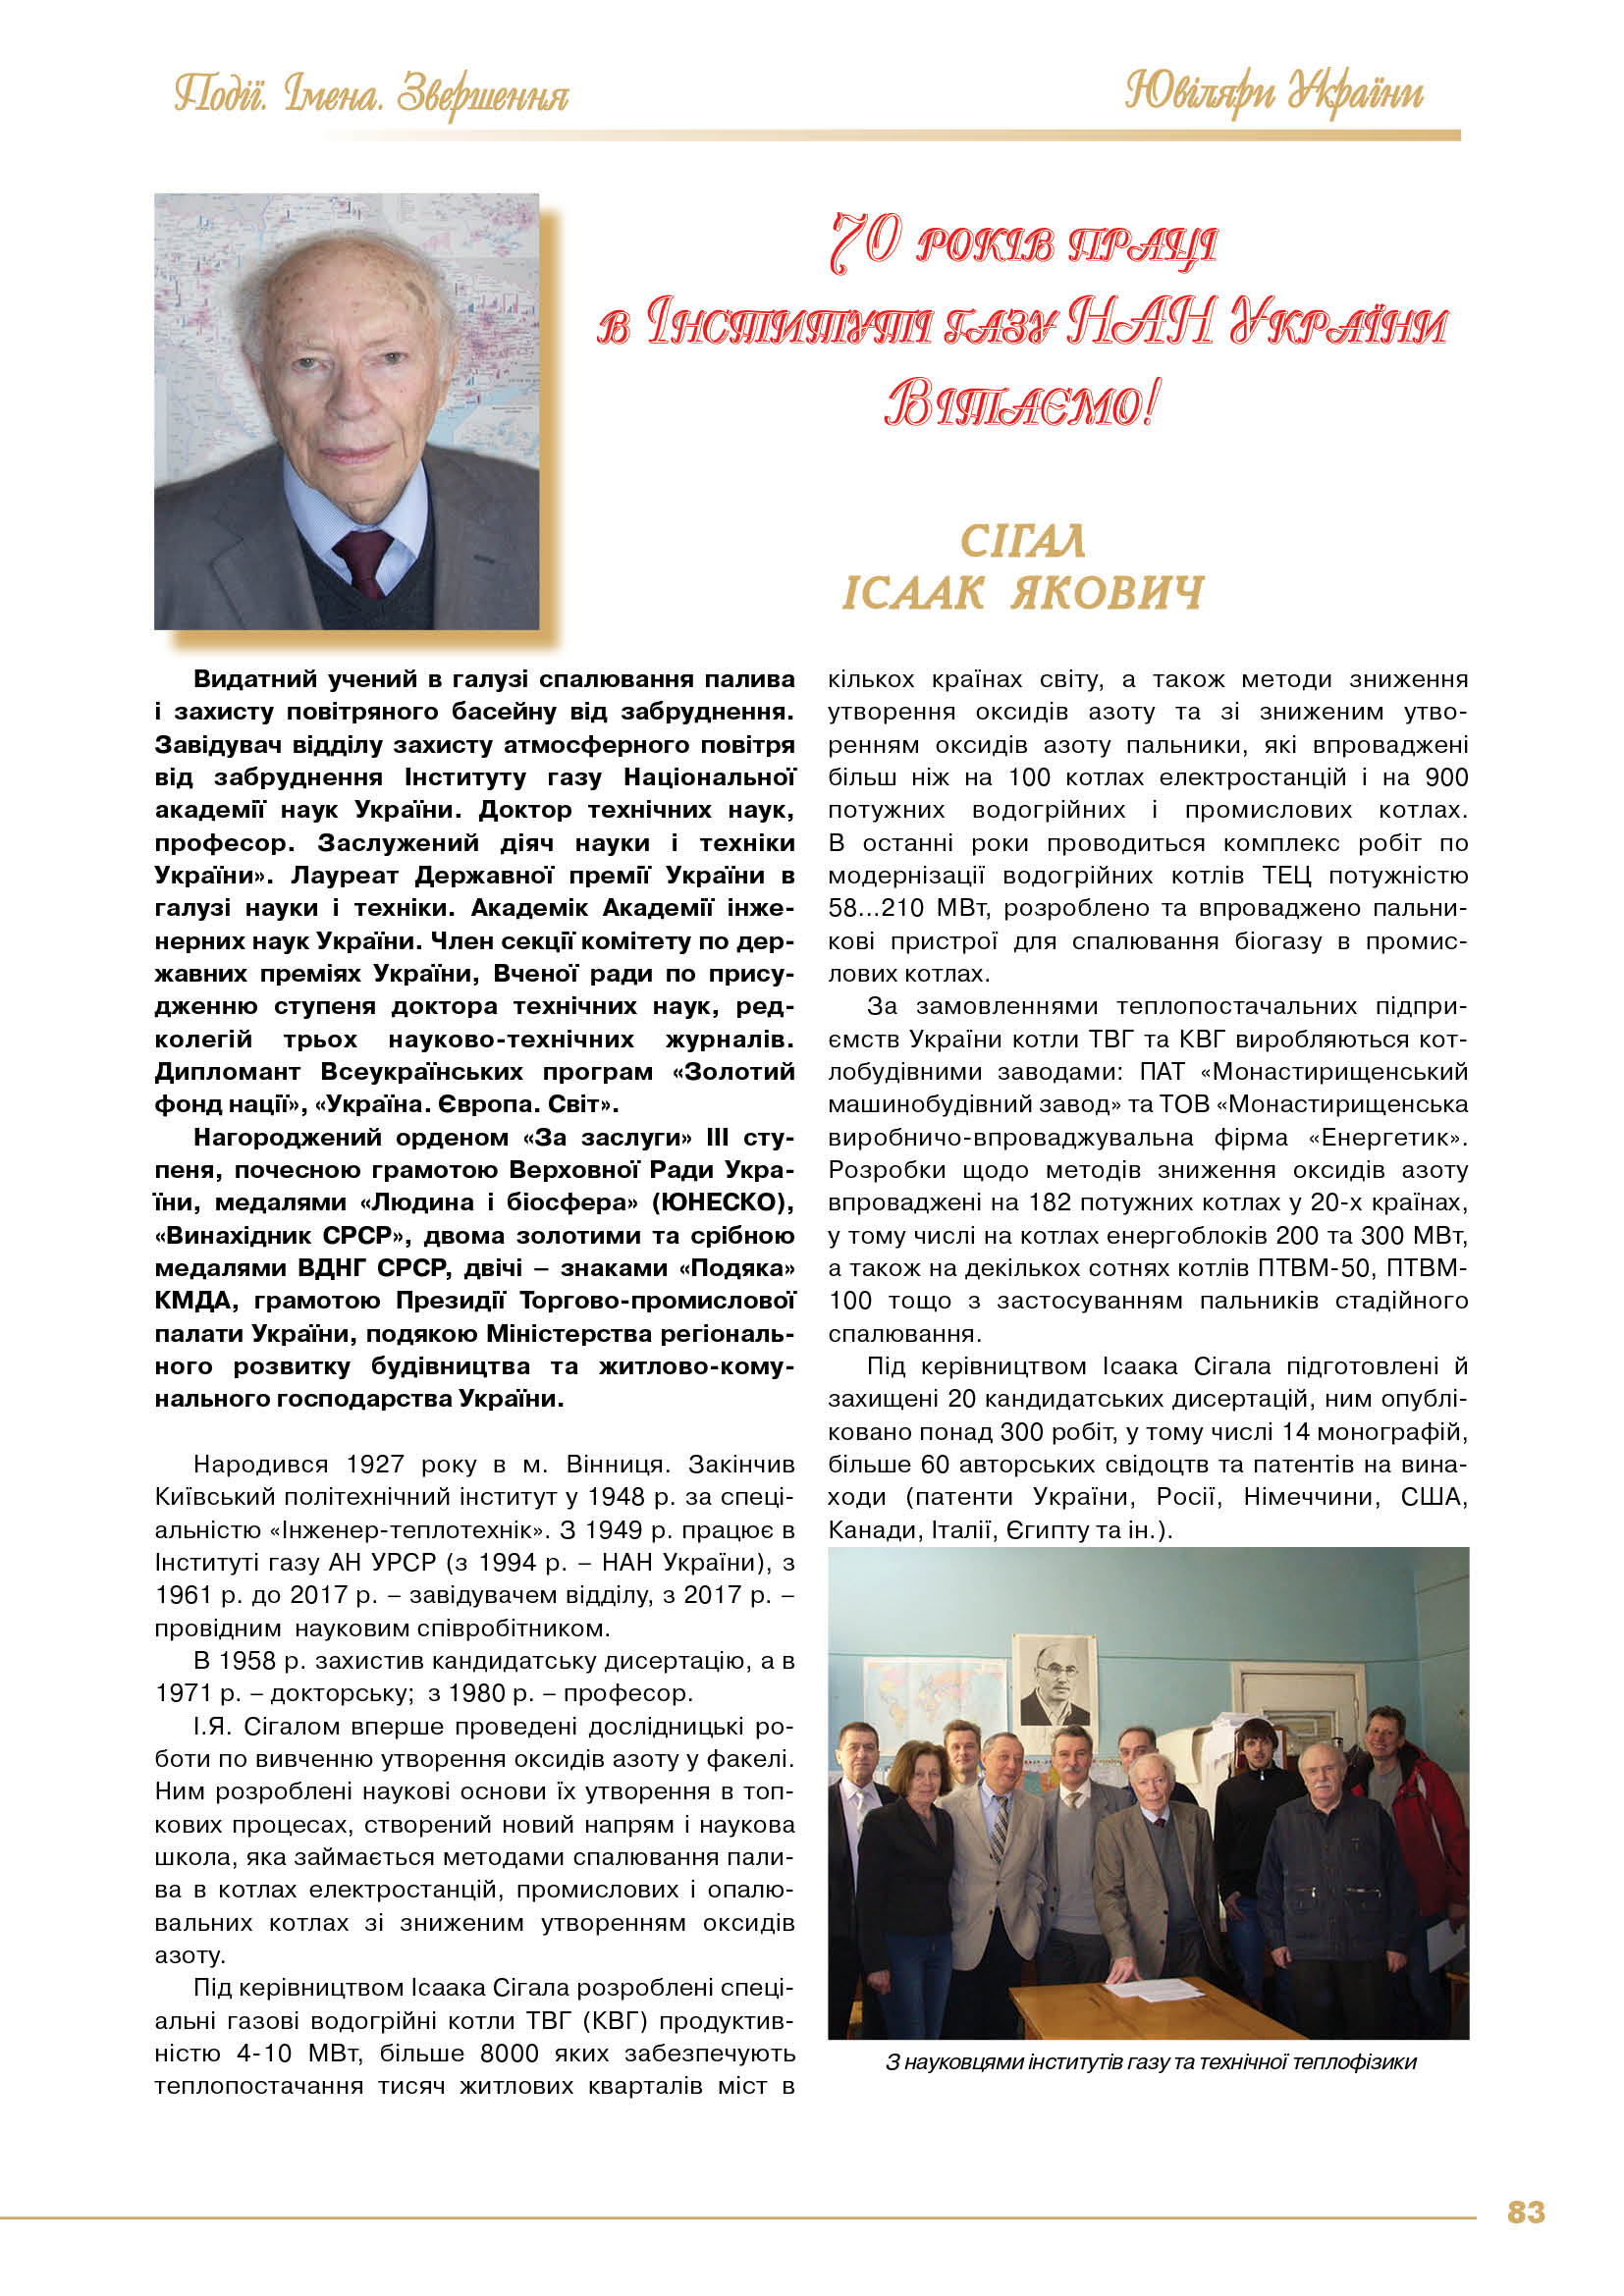 Сігал Ісаак Якович